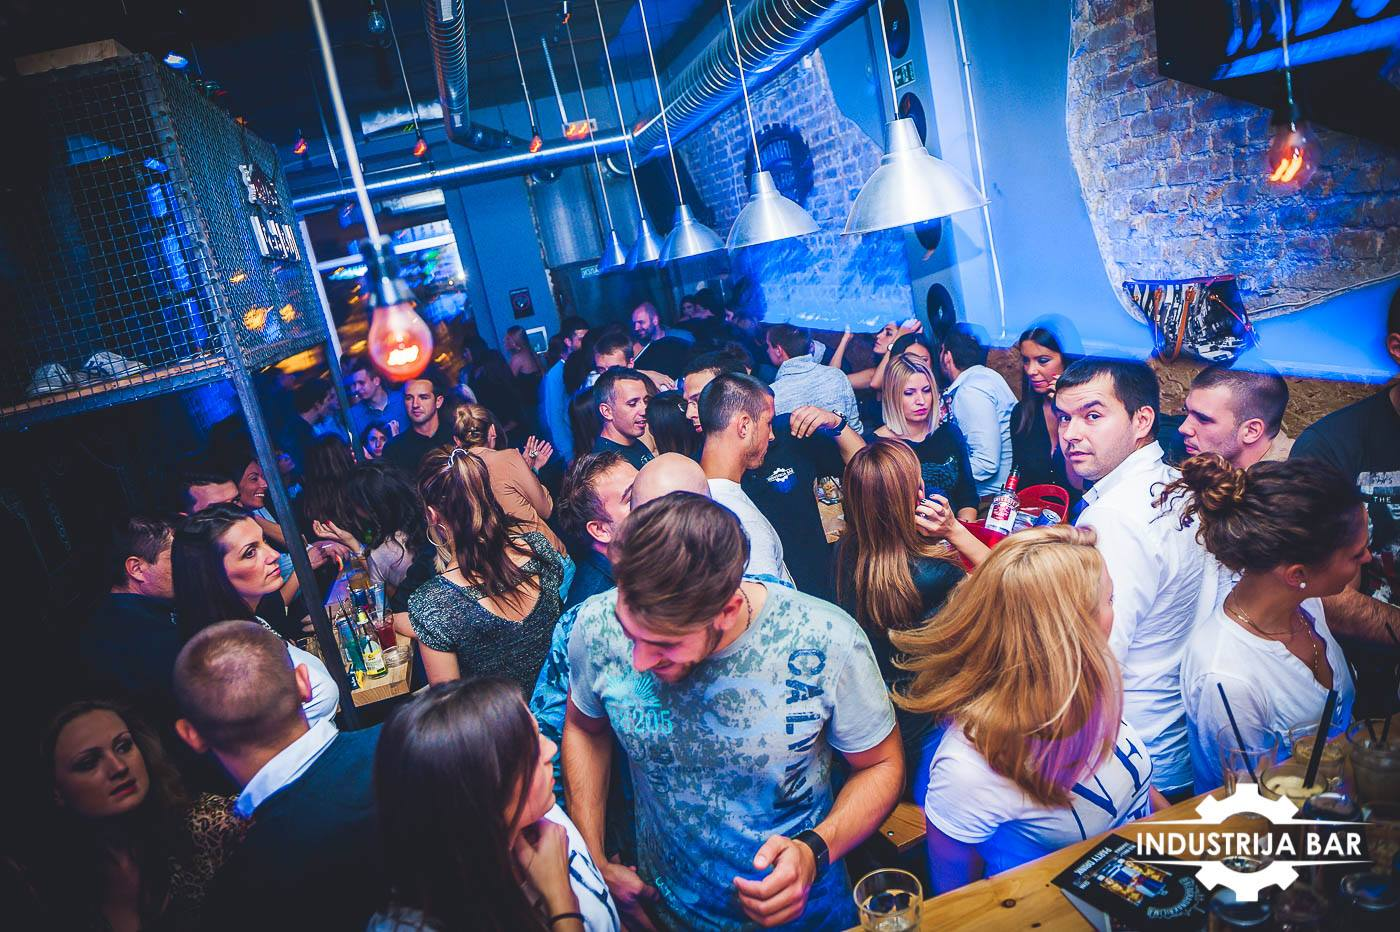 Industrija Bar Beograd